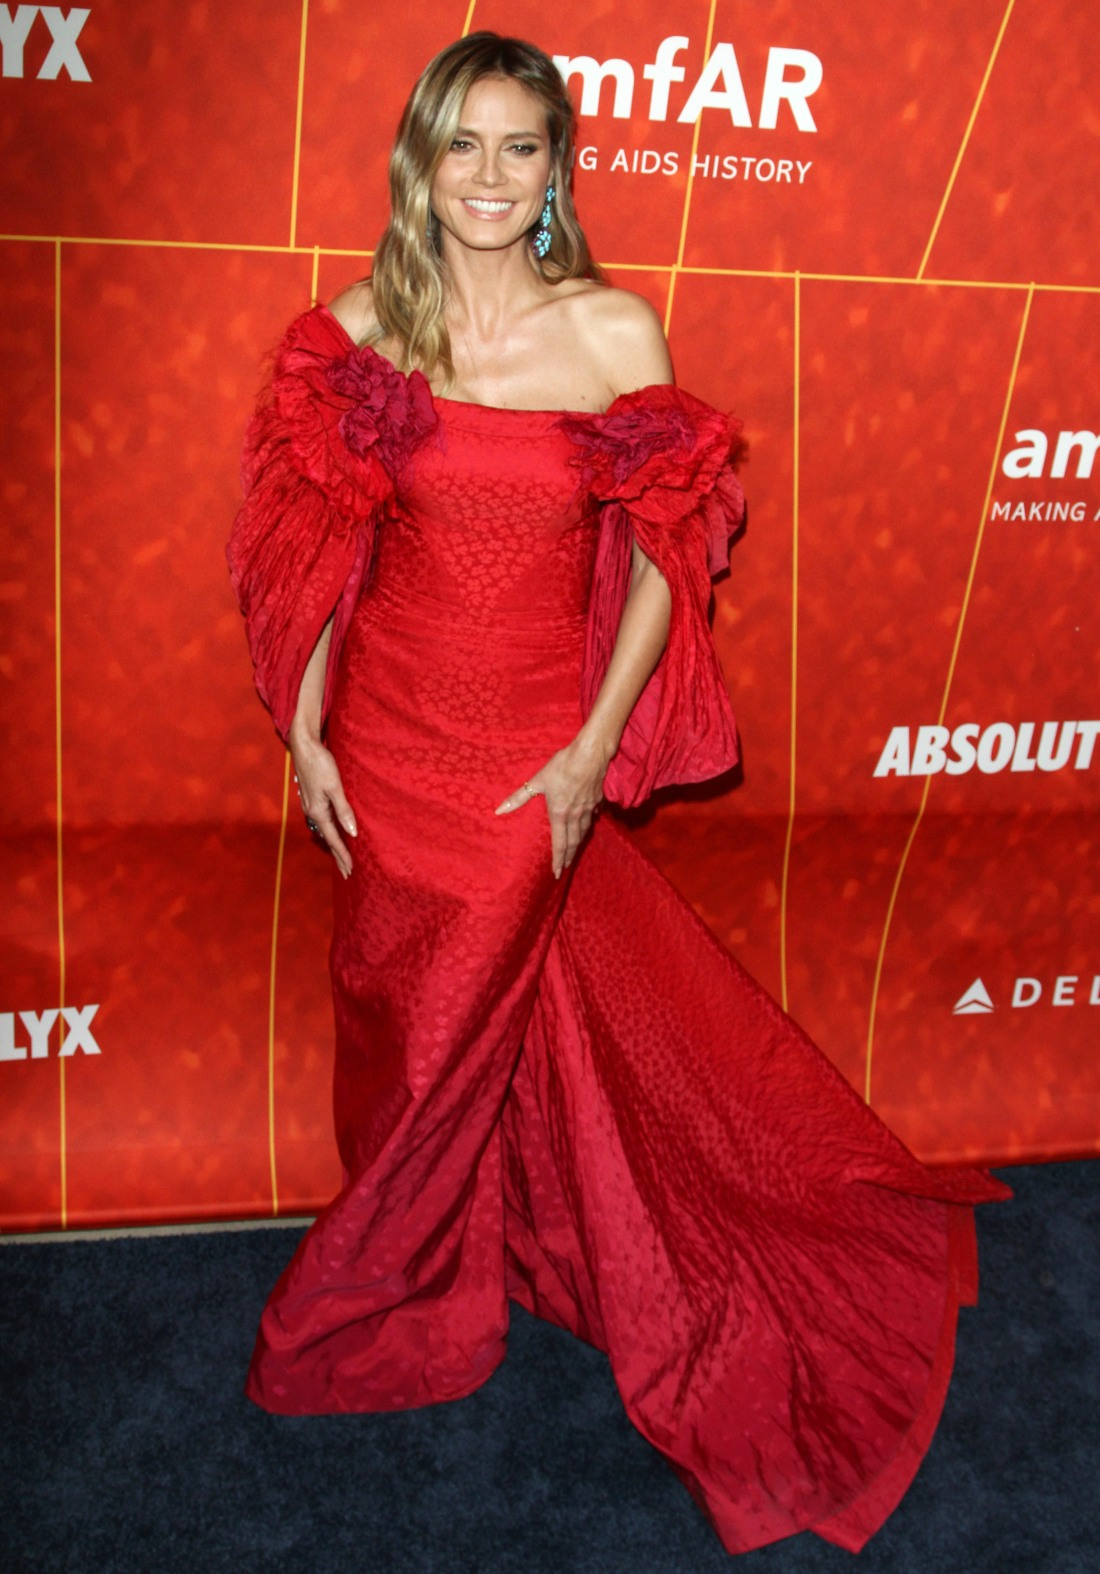 Heidi Klum attends The the amFAR Gala in Los Angeles